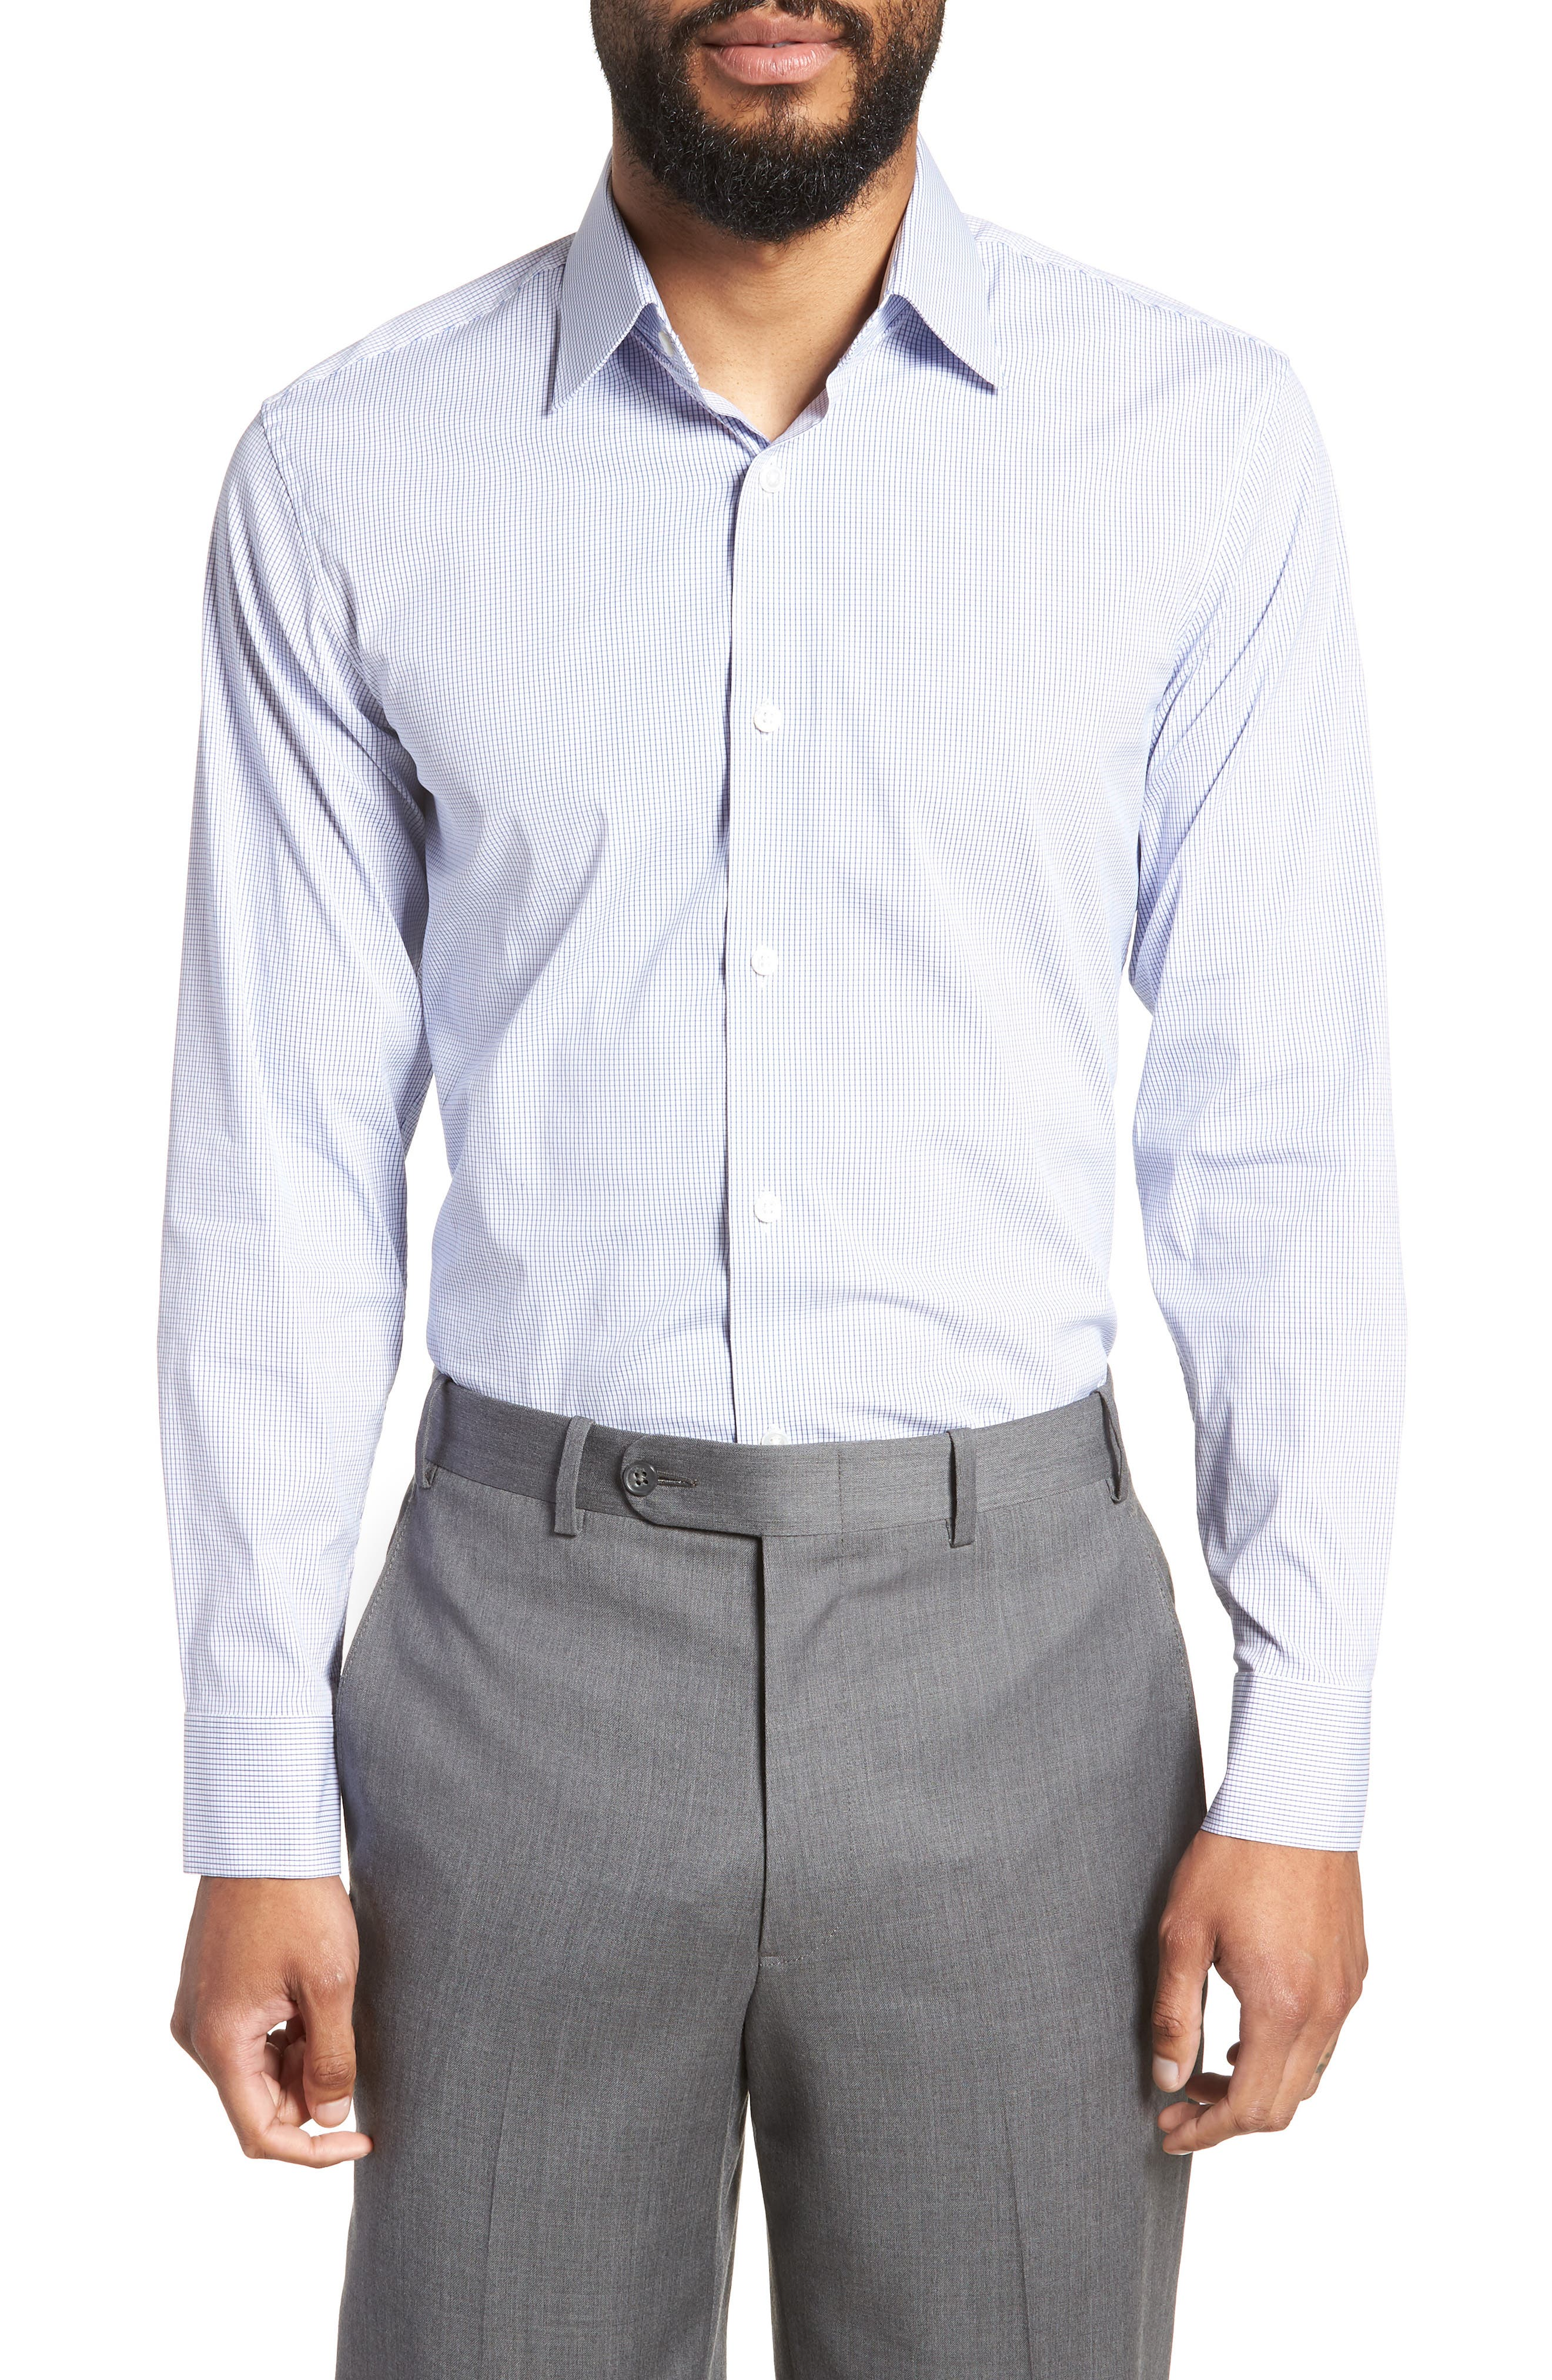 Jetsetter Slim Fit Stretch Check Dress Shirt,                         Main,                         color, NAVY MINI CHECK